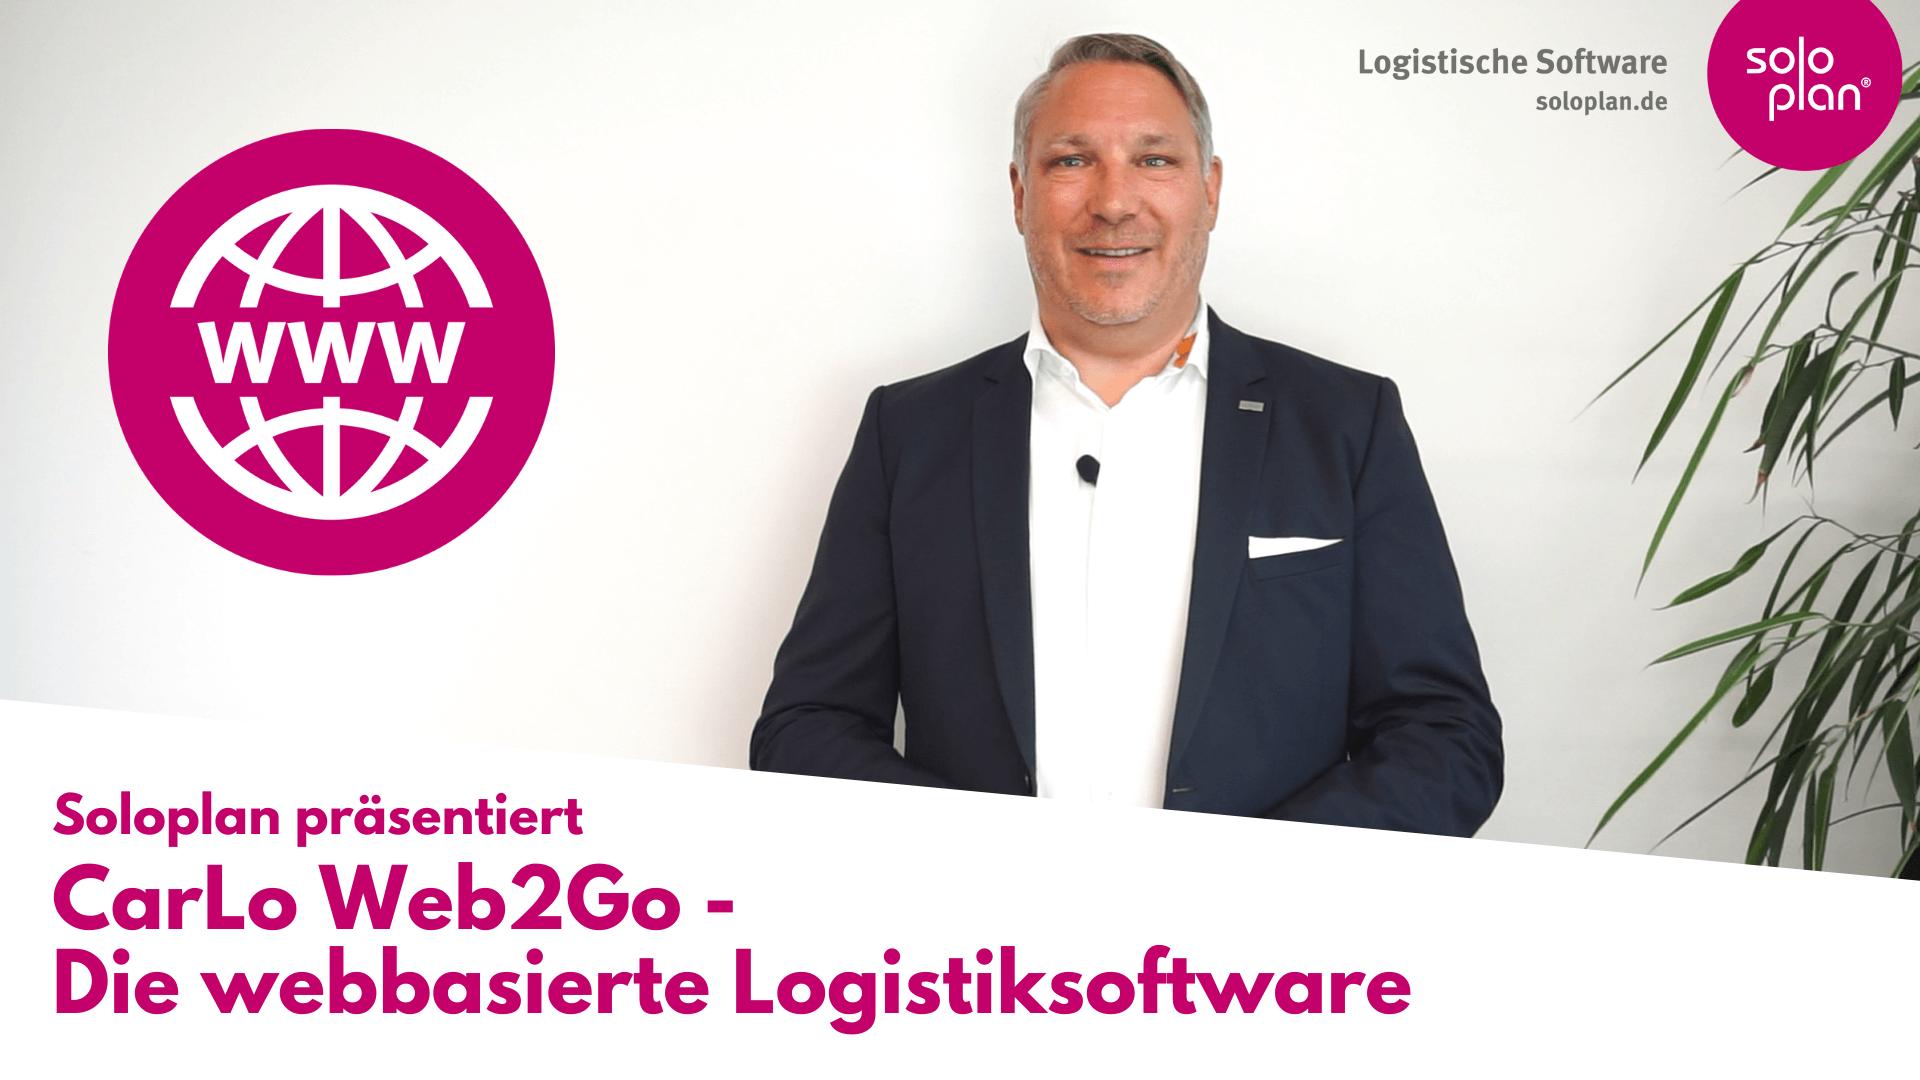 CarLo Web2Go - die webbasierte Logistiksoftware